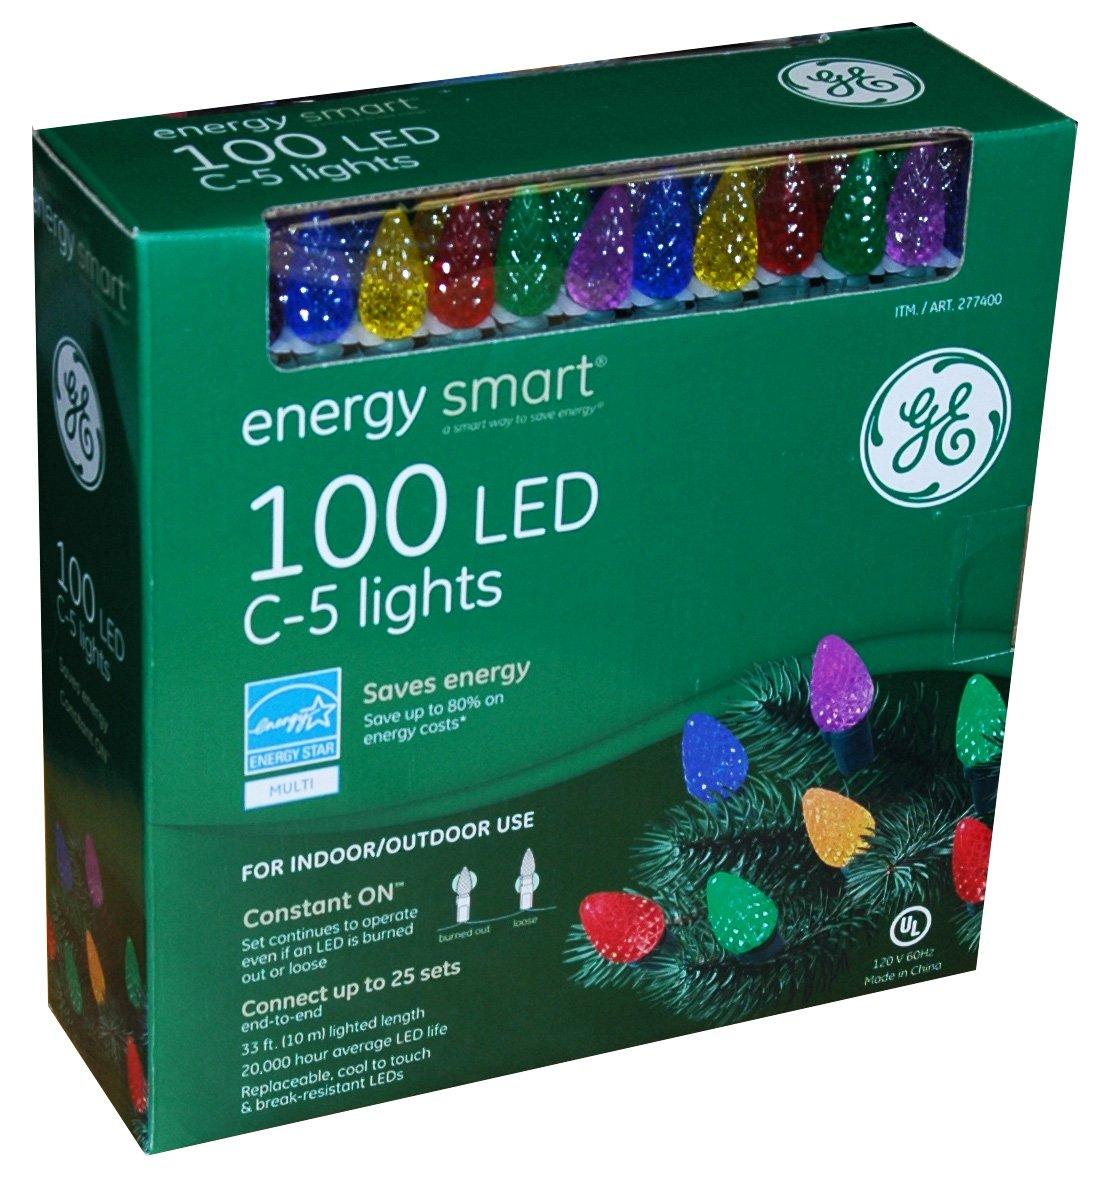 amazoncom 100 led c 5 holiday christmas lights multi color kitchen dining - 100 Led Christmas Lights